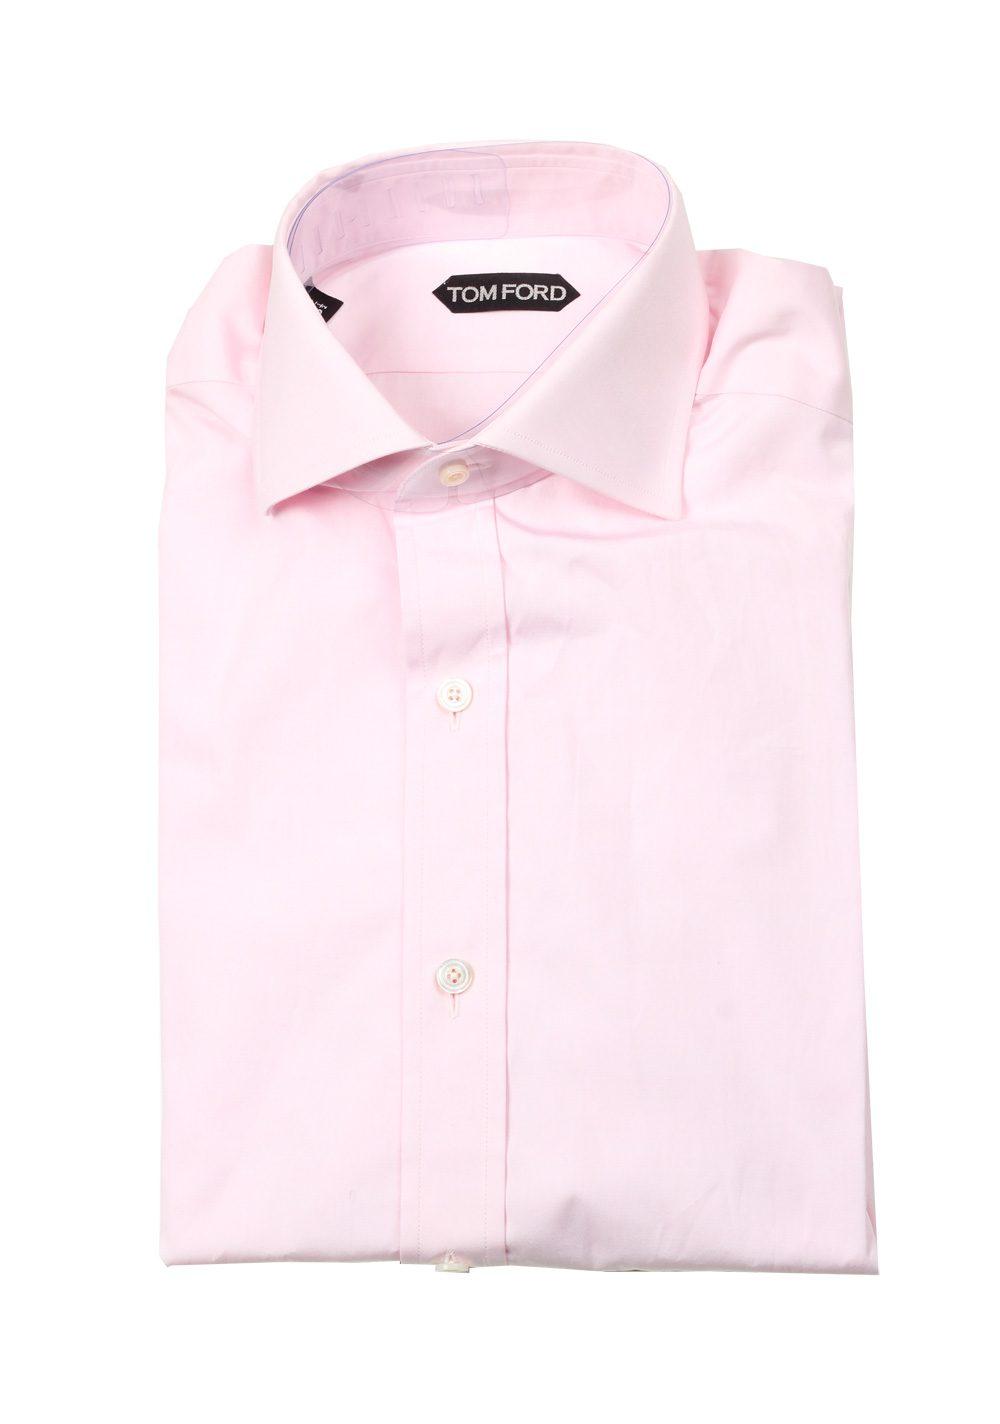 TOM FORD Solid Pink Dress Shirt Size 44 / 17,5 U.S. | Costume Limité